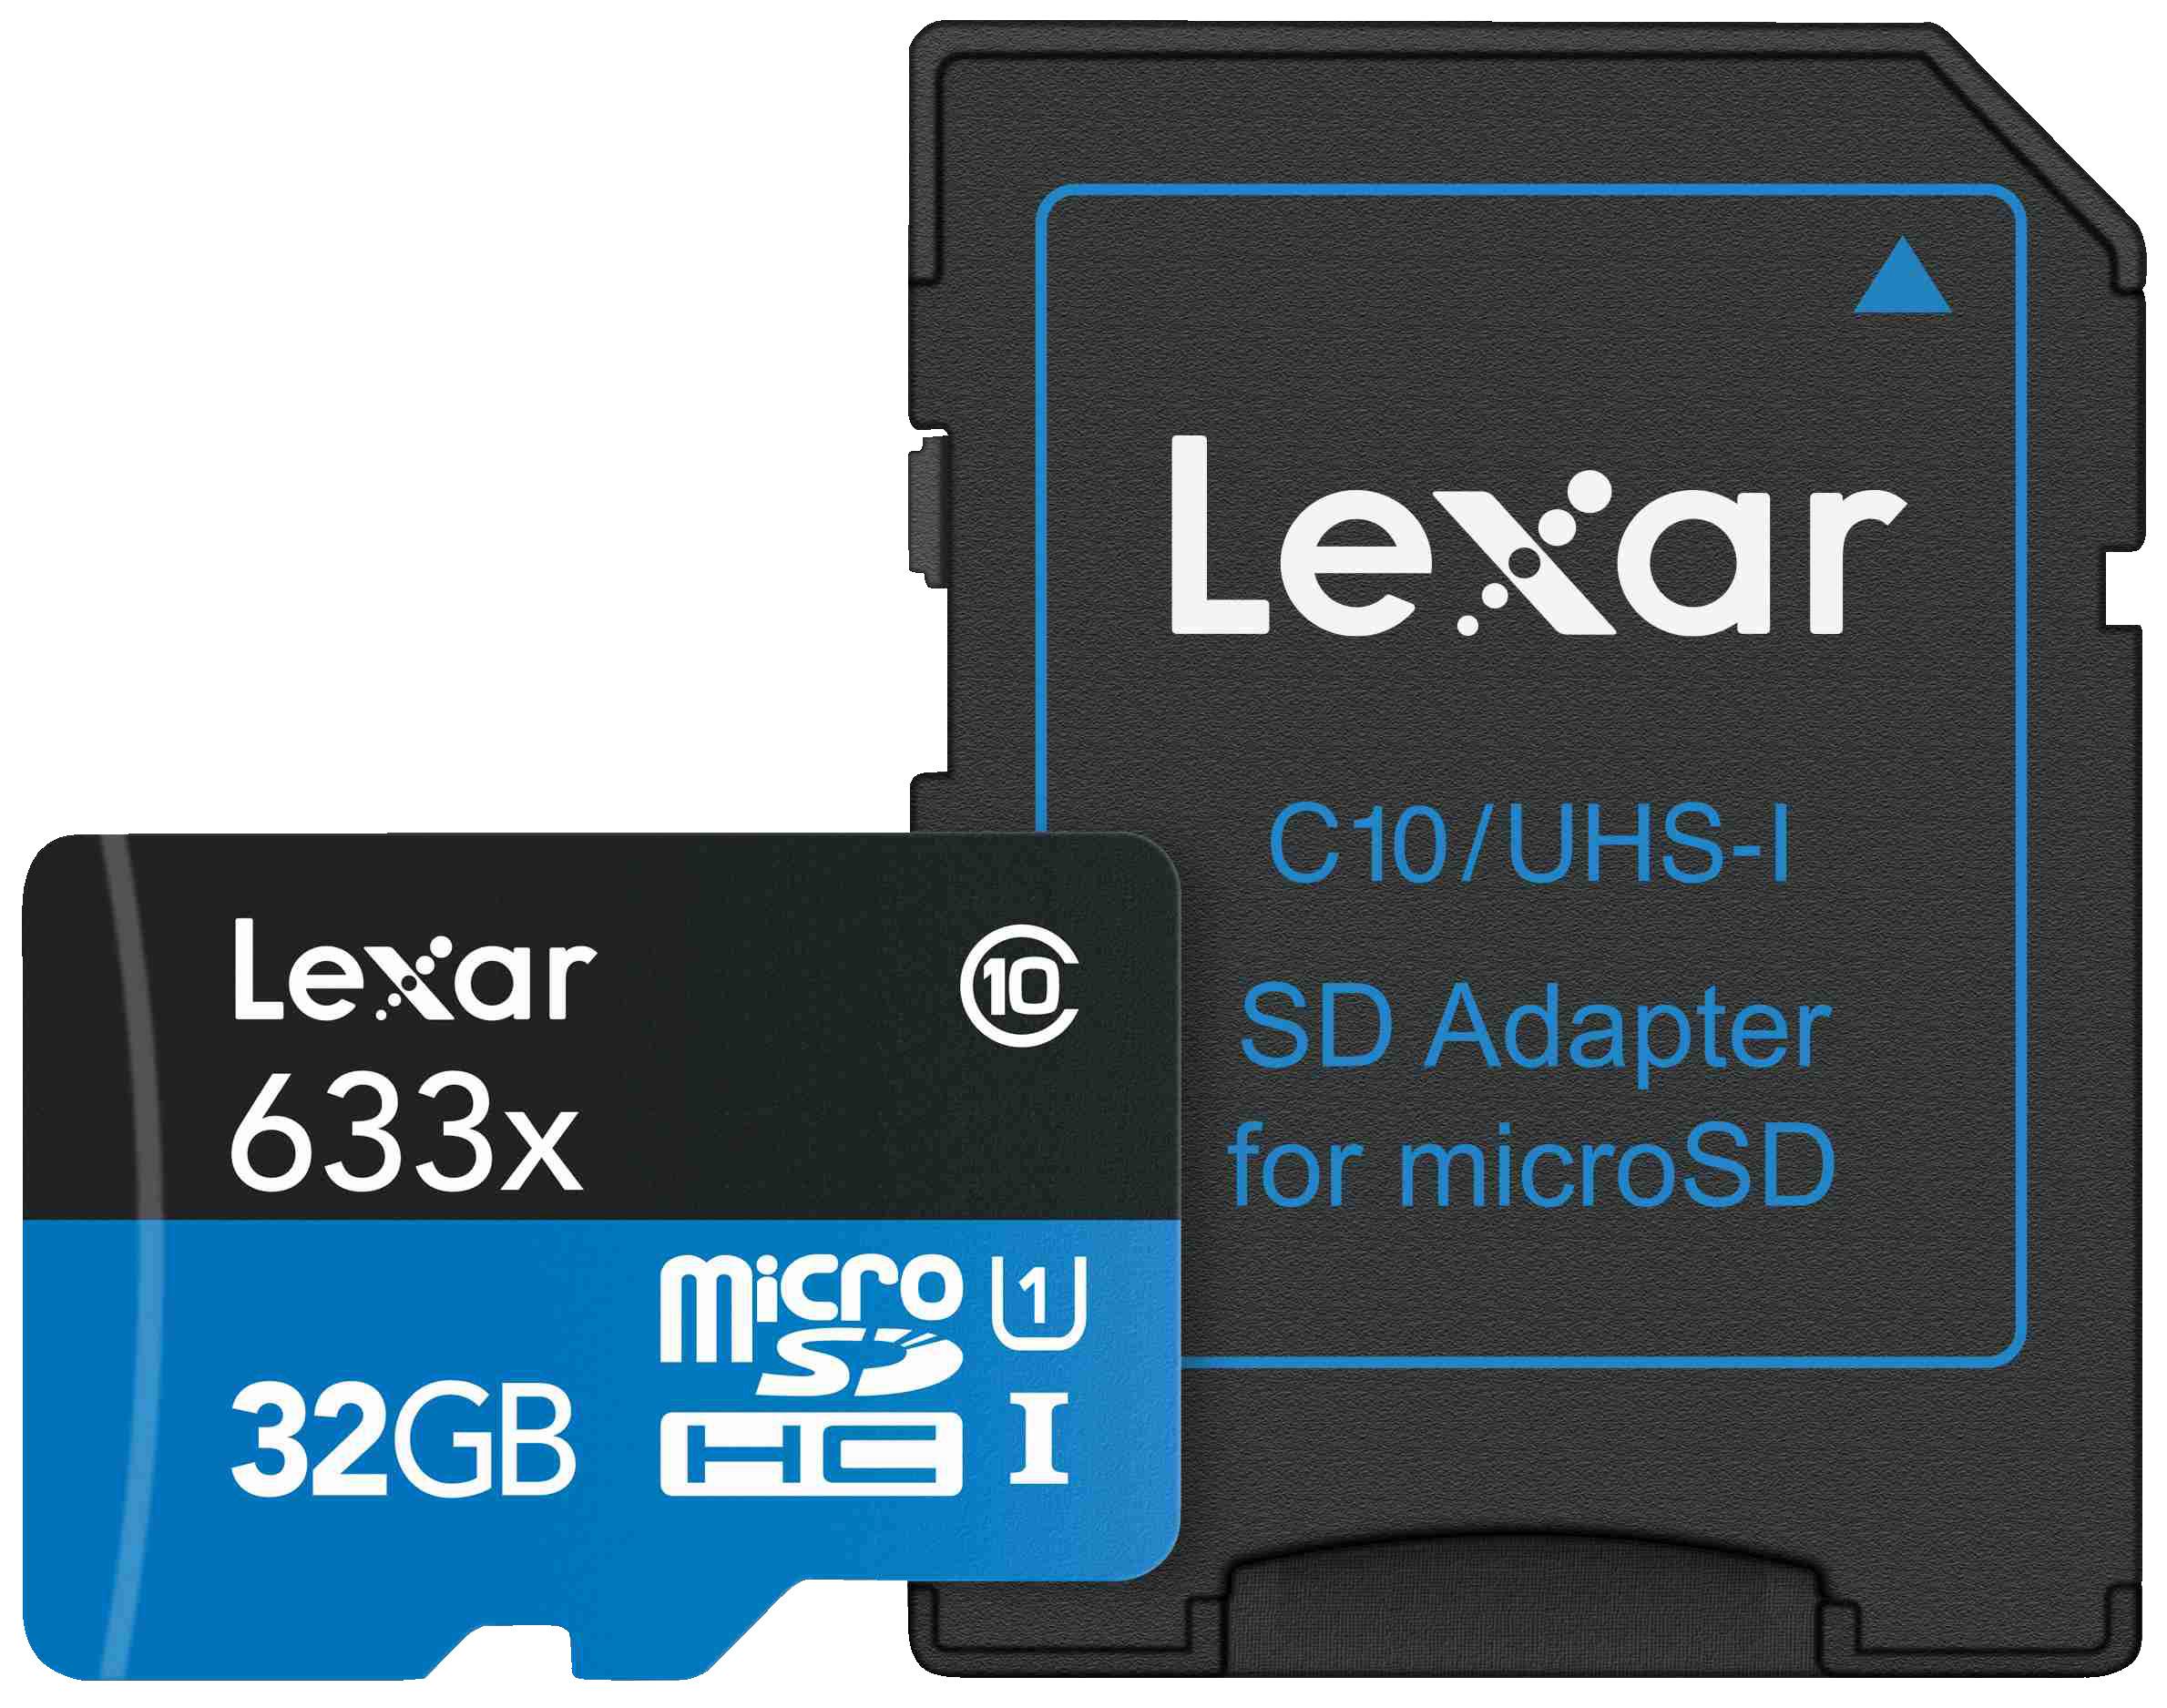 Lexar 633x microSDHC mit 32GB für 10,99€ inkl Versand (Redcoon)